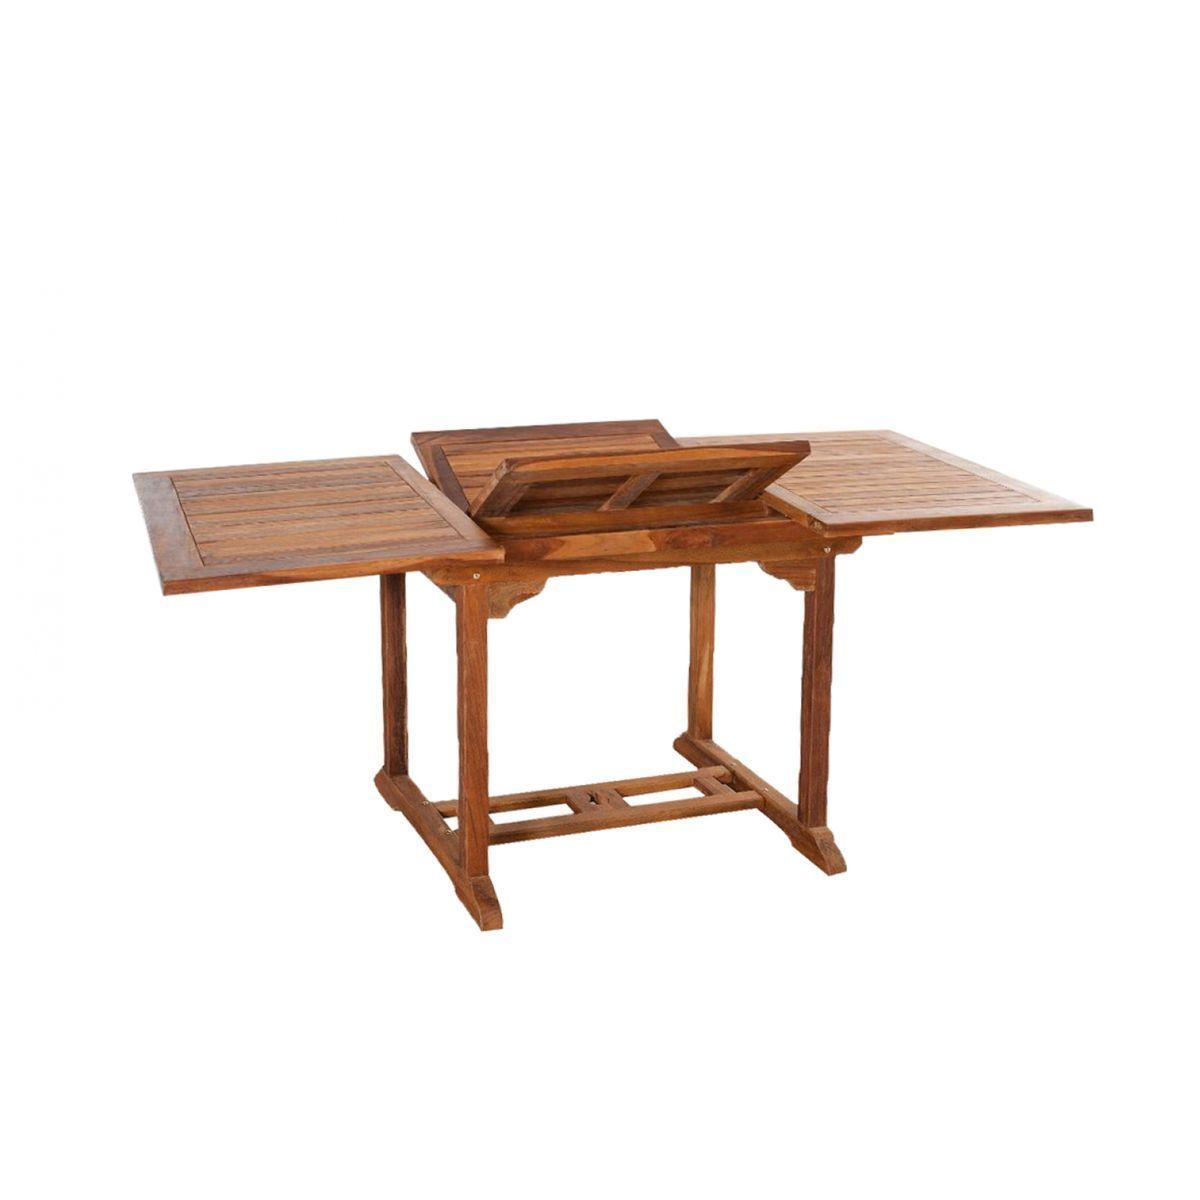 Lubok : Salon de jardin Teck huilé 6 personnes - Table ...